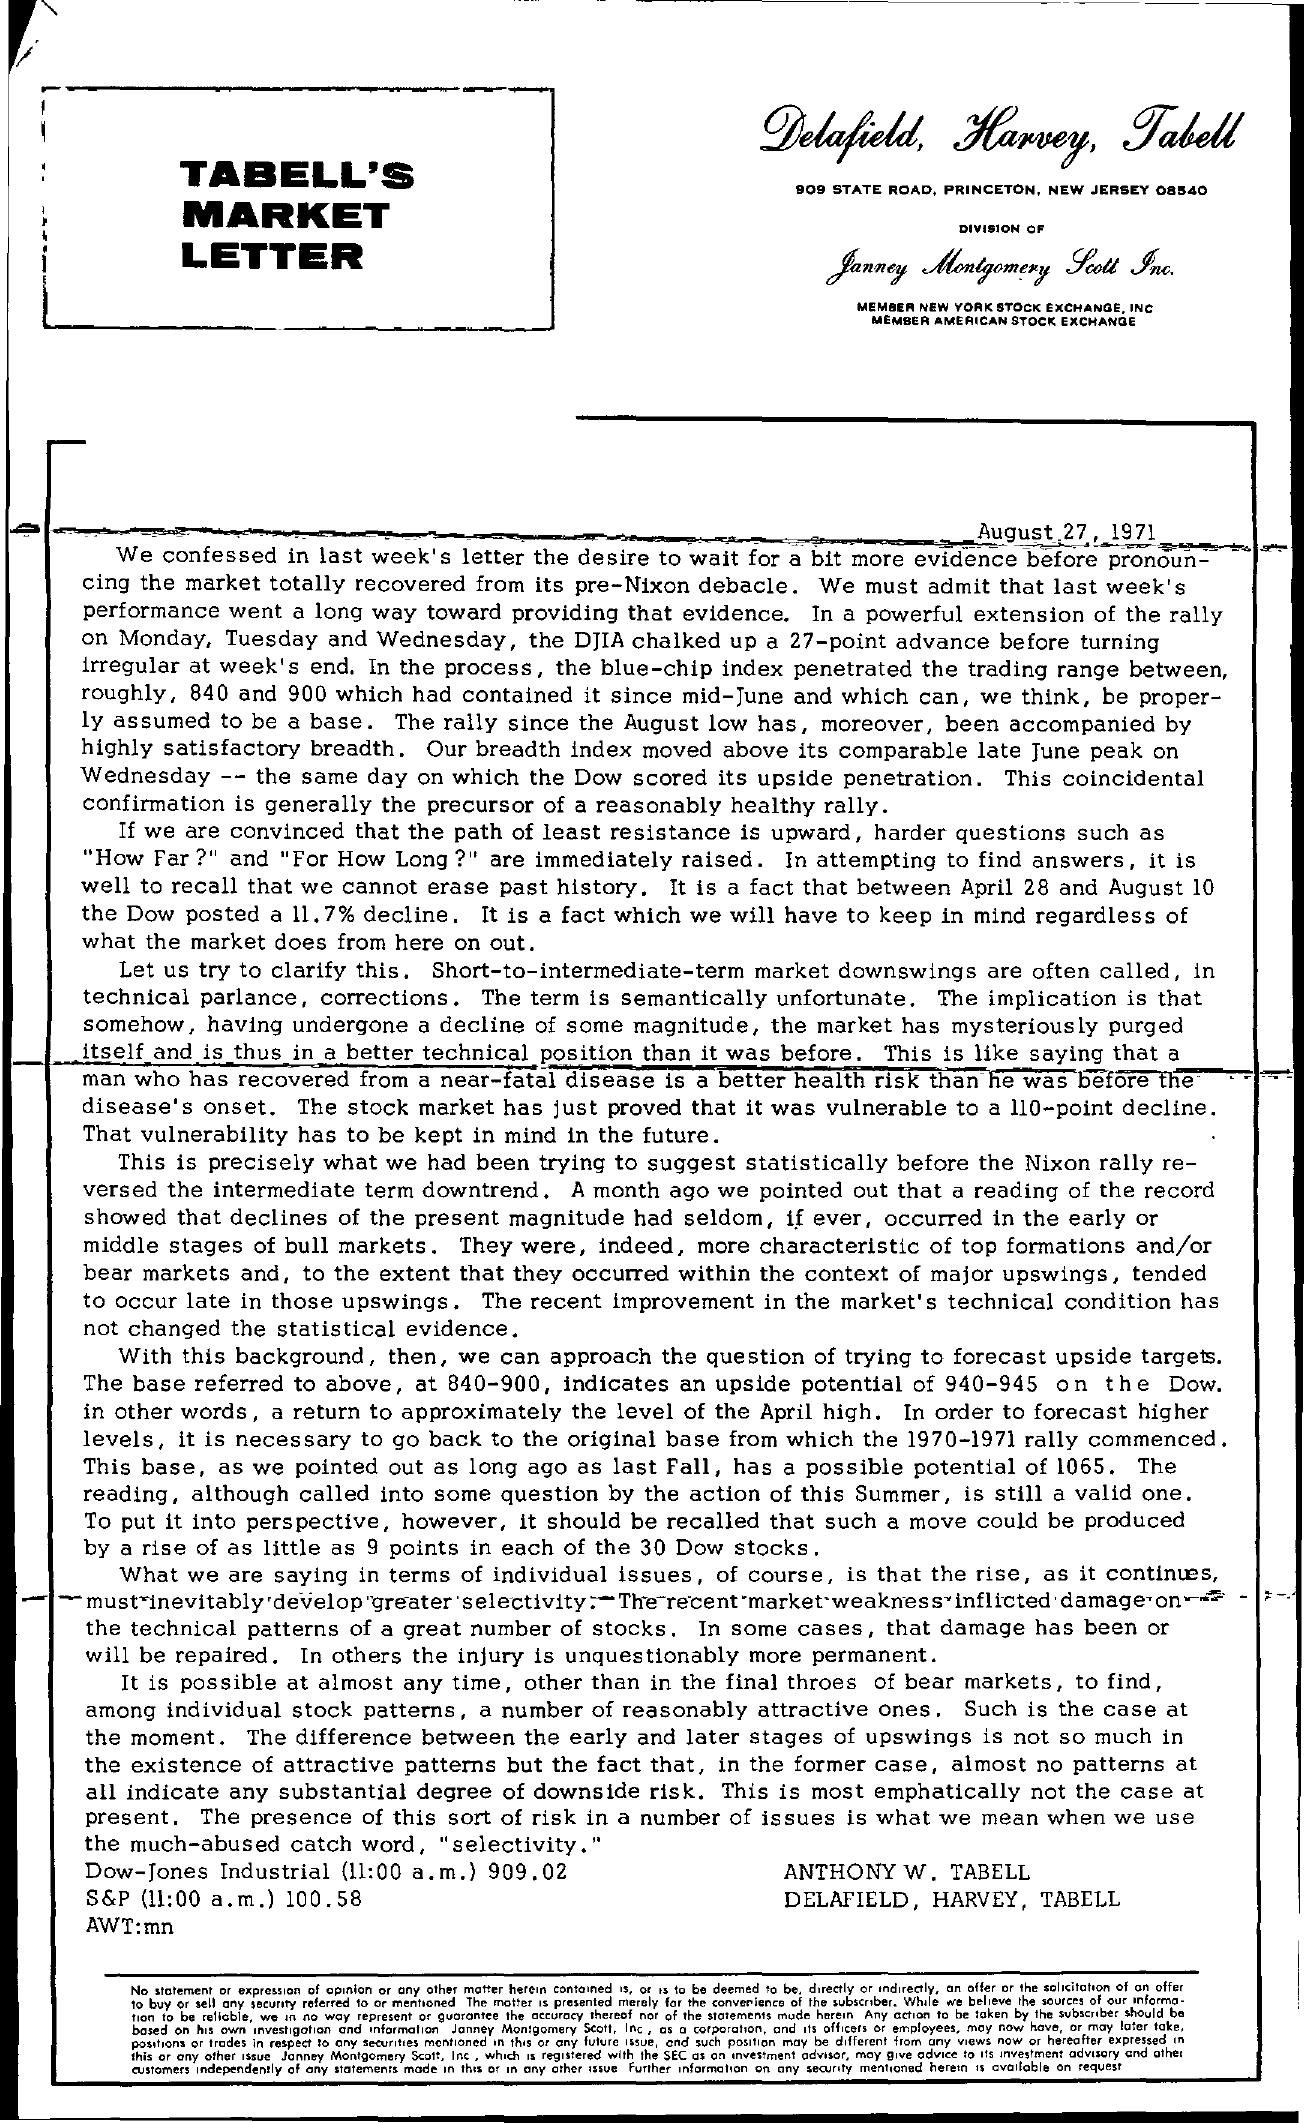 Tabell's Market Letter - August 27, 1971